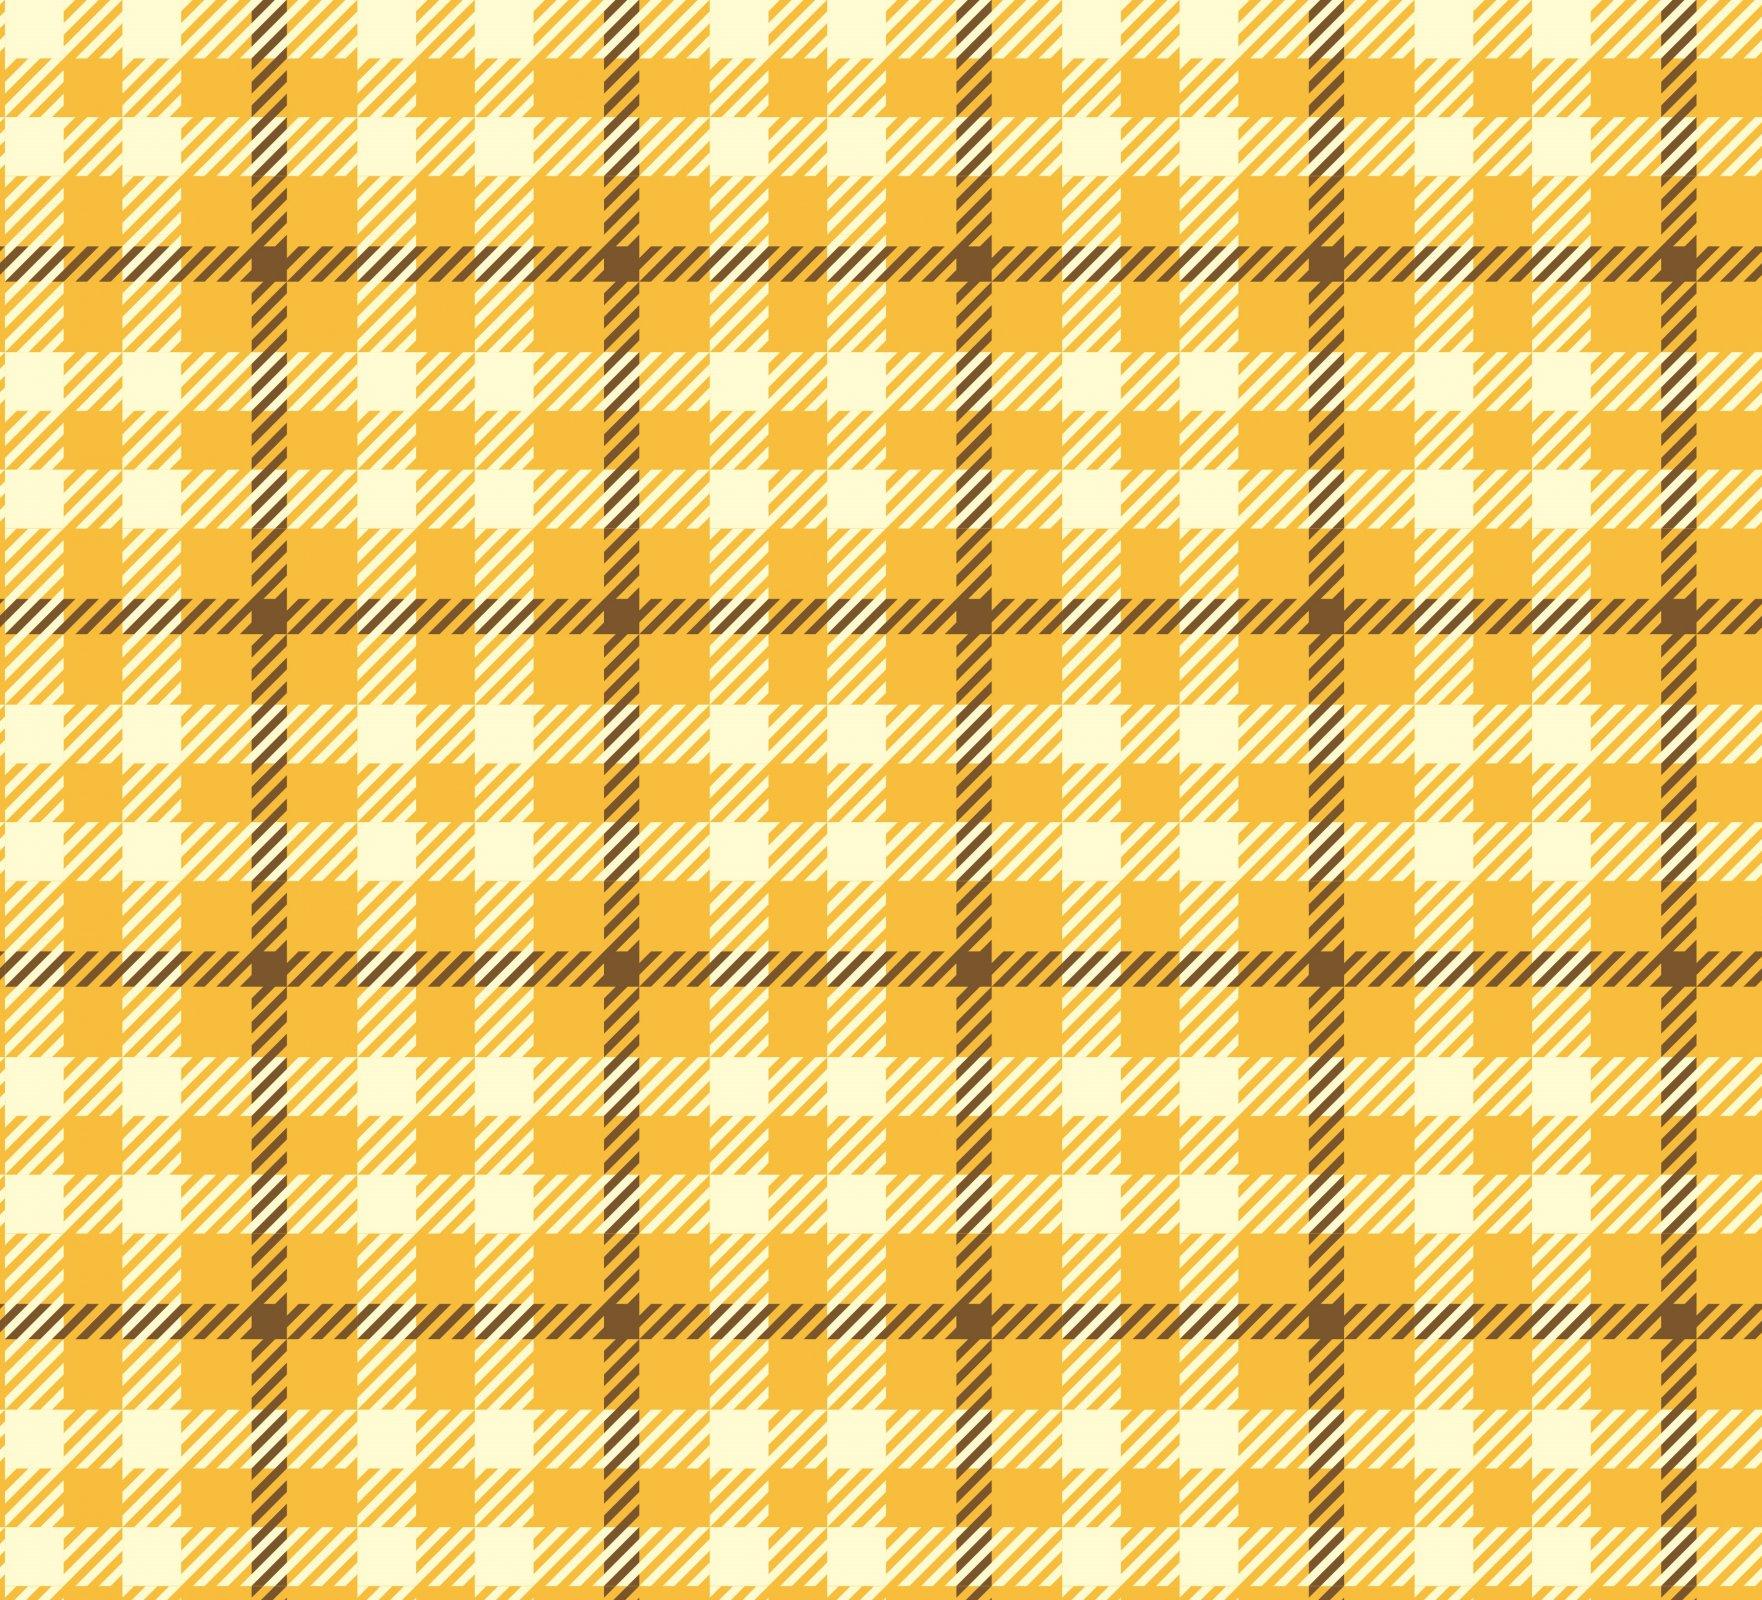 DT-Rosette Garden DX-1868-0C-1 Yellow - Spring Tartan